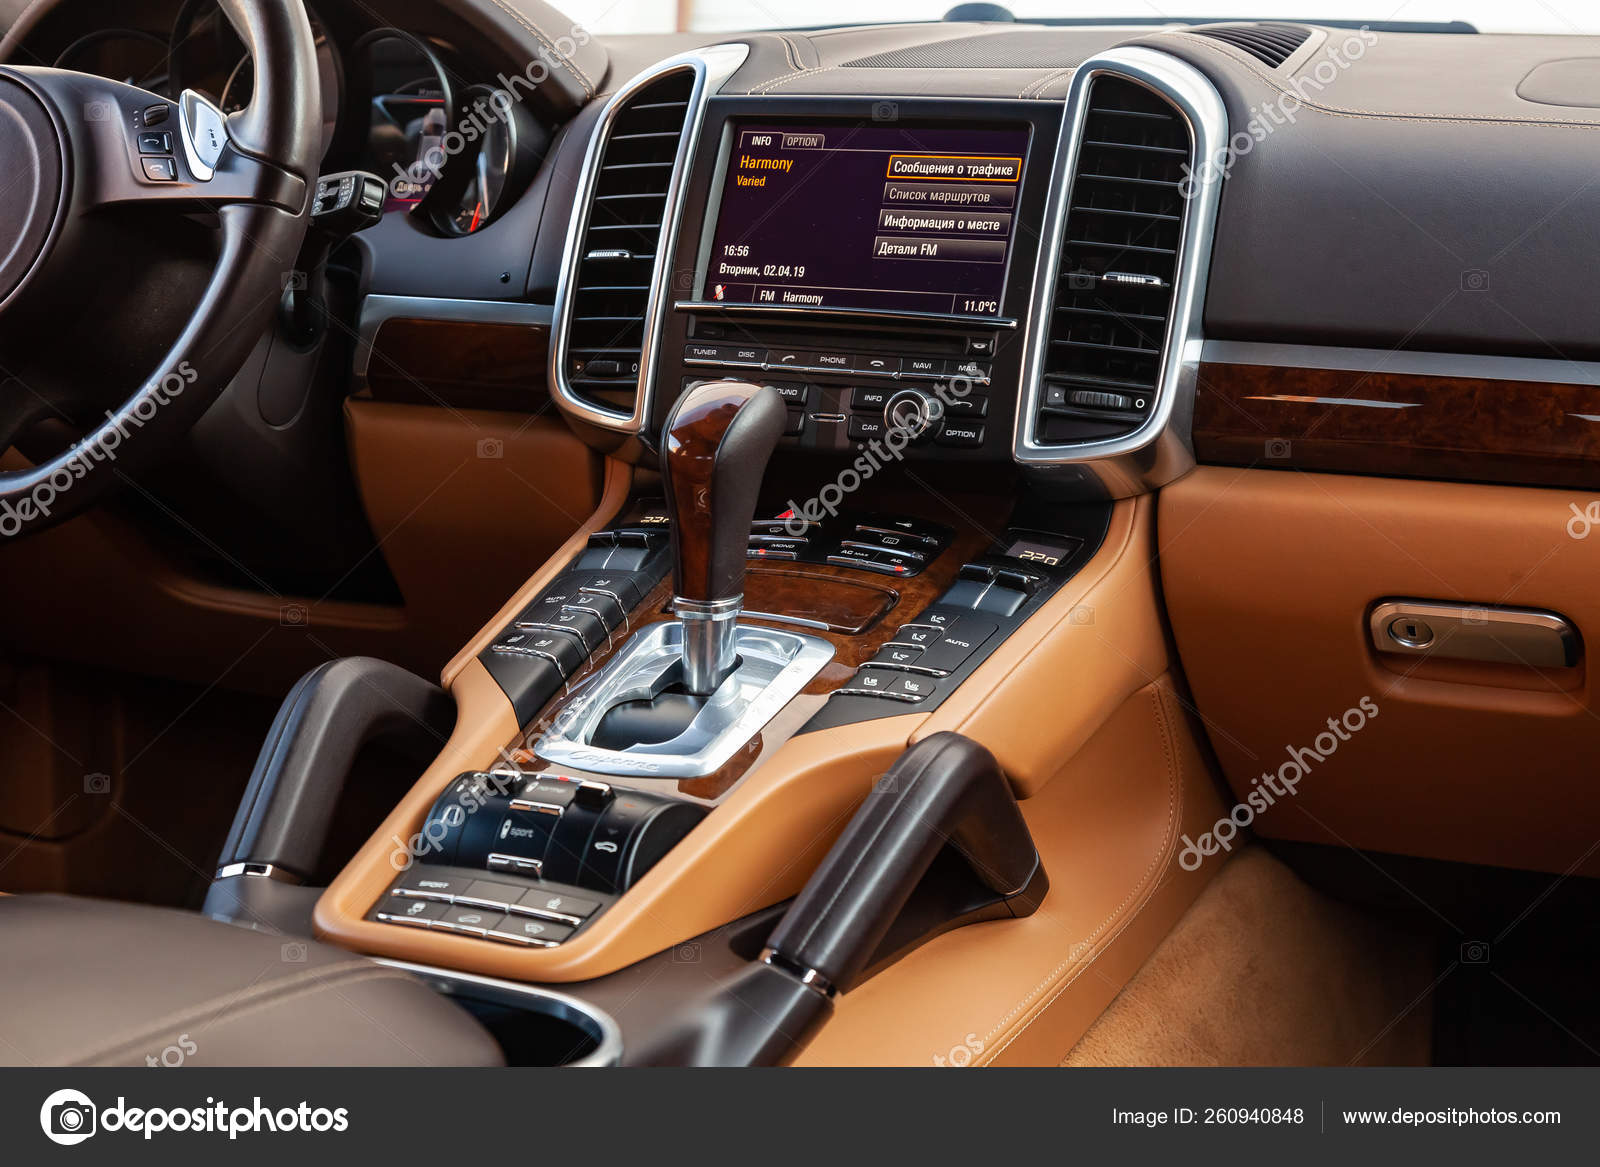 The Interior Of The Car Porsche Cayenne 958 2011 Year With A Vie Stock Editorial Photo C Aleksandrkondratov 260940848